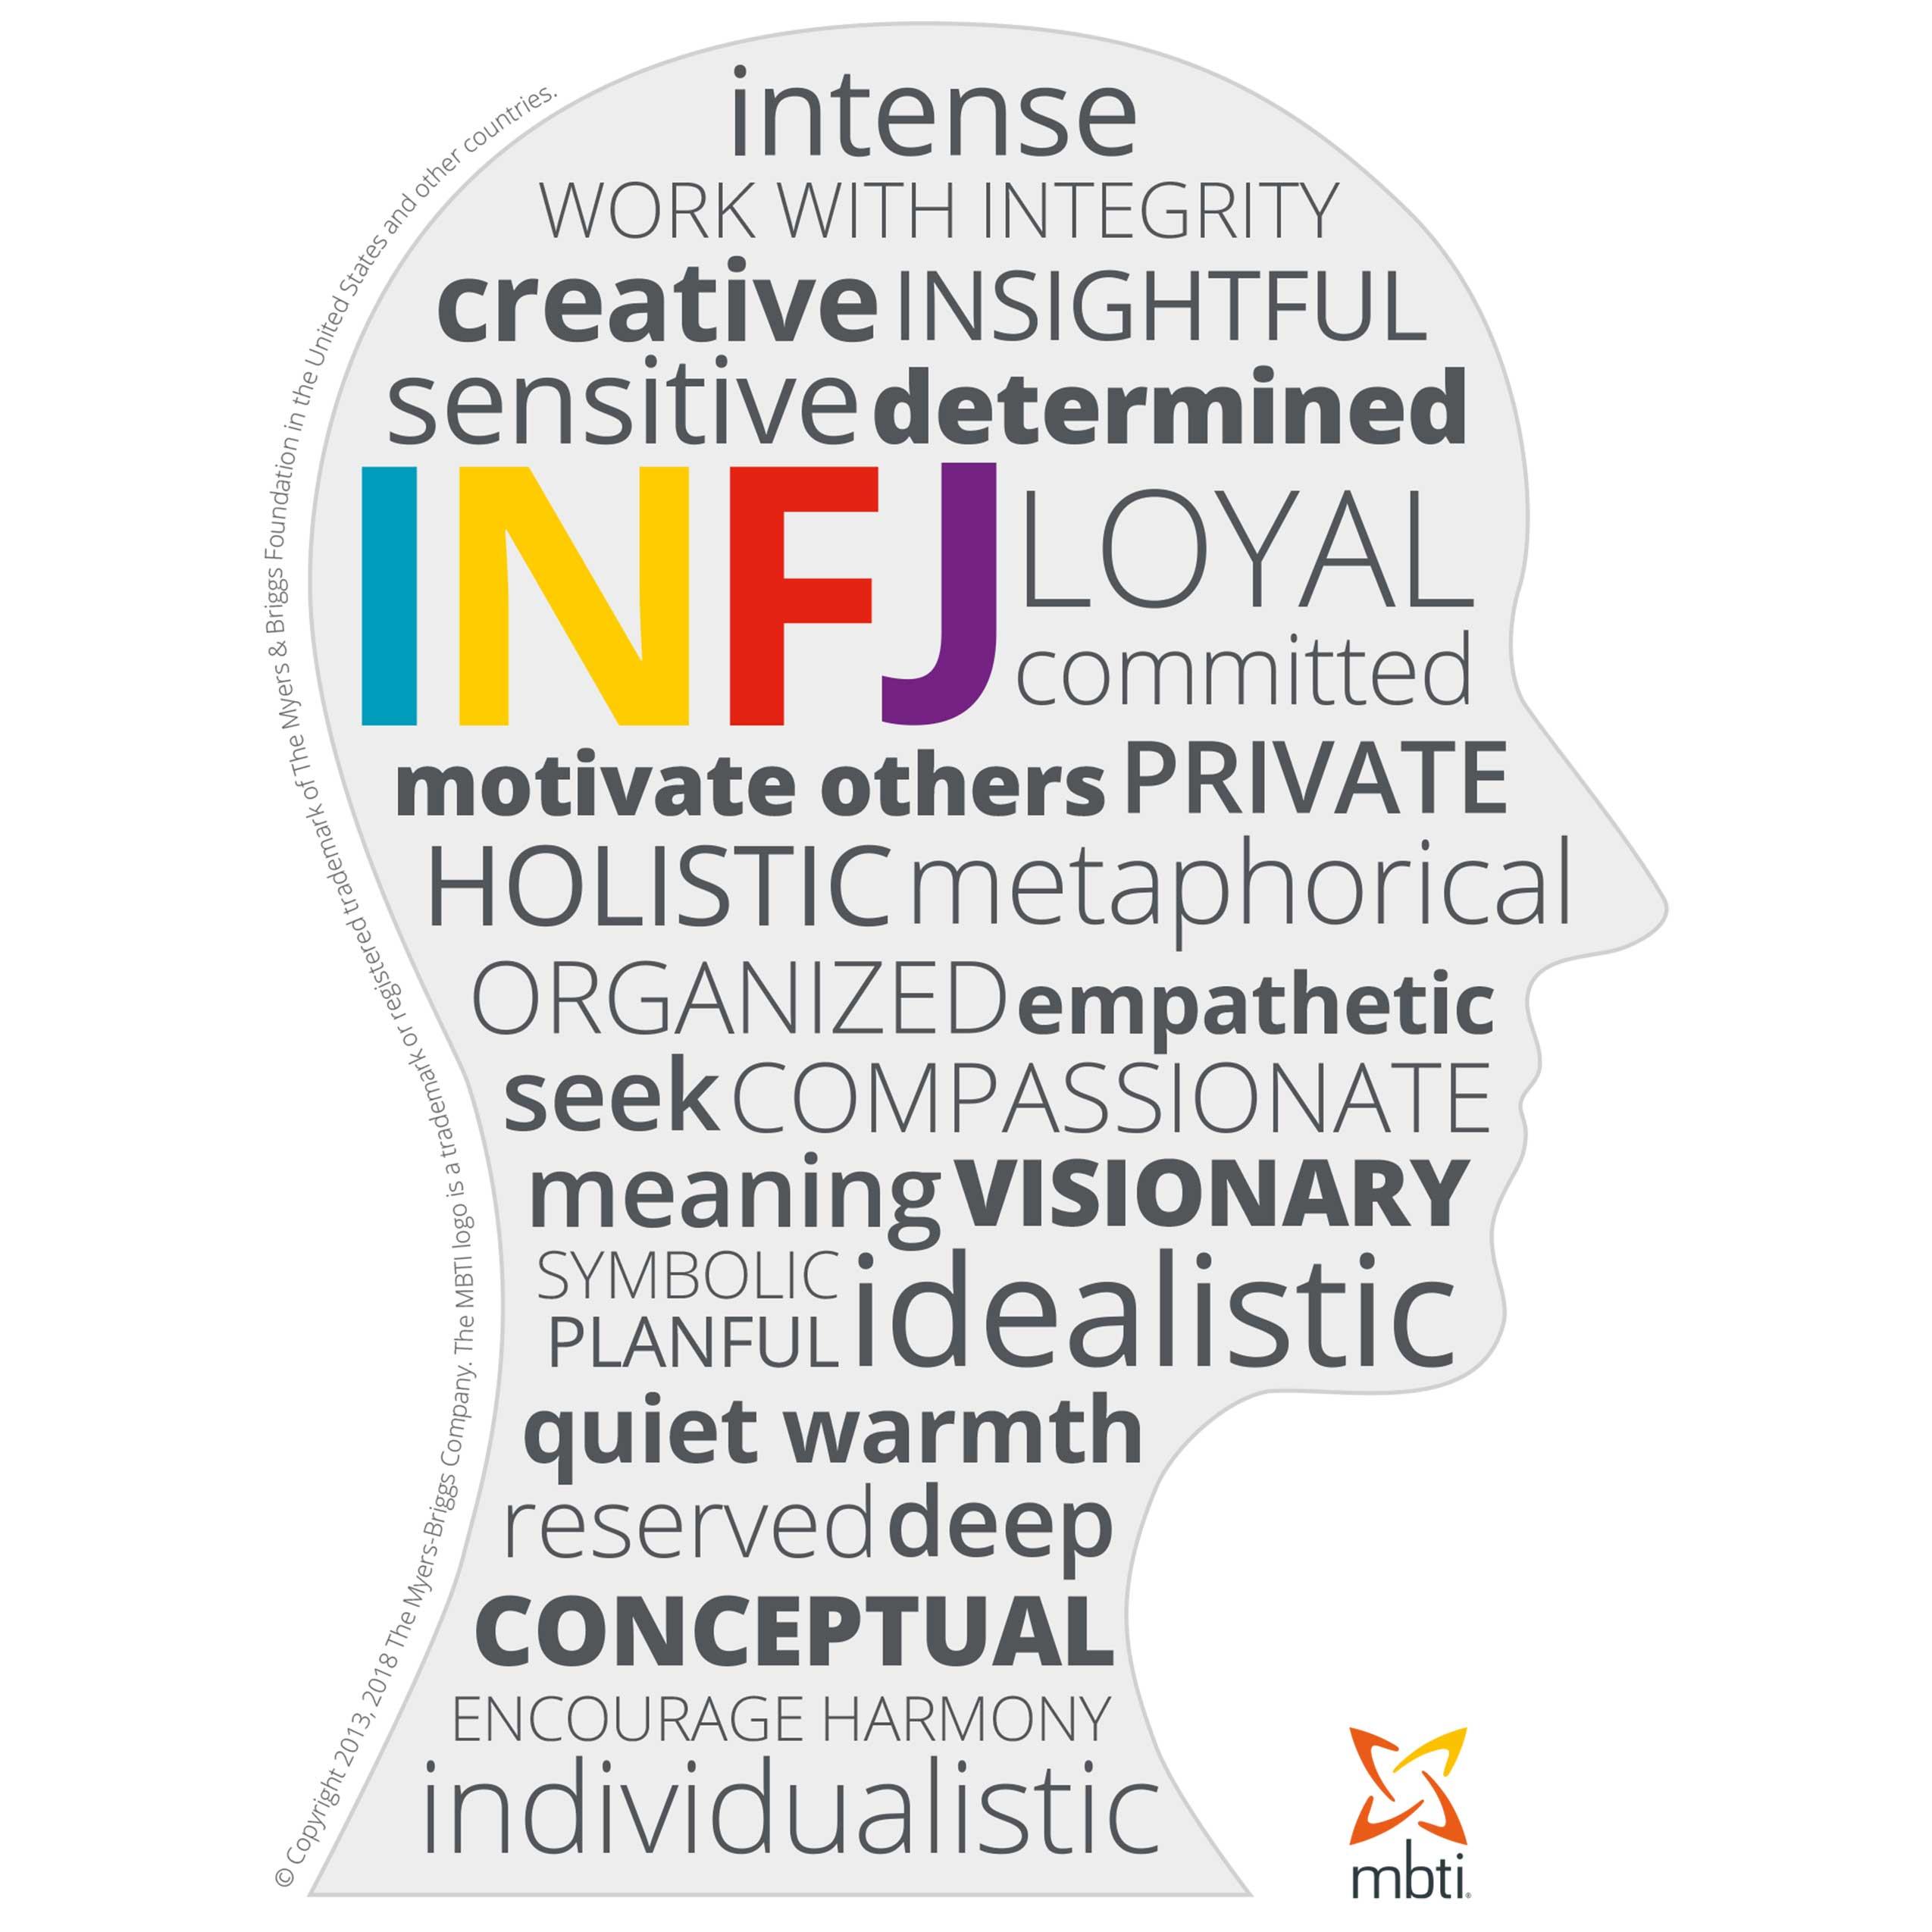 MBTI Myers-Briggs Personality Type Characteristics INFJ